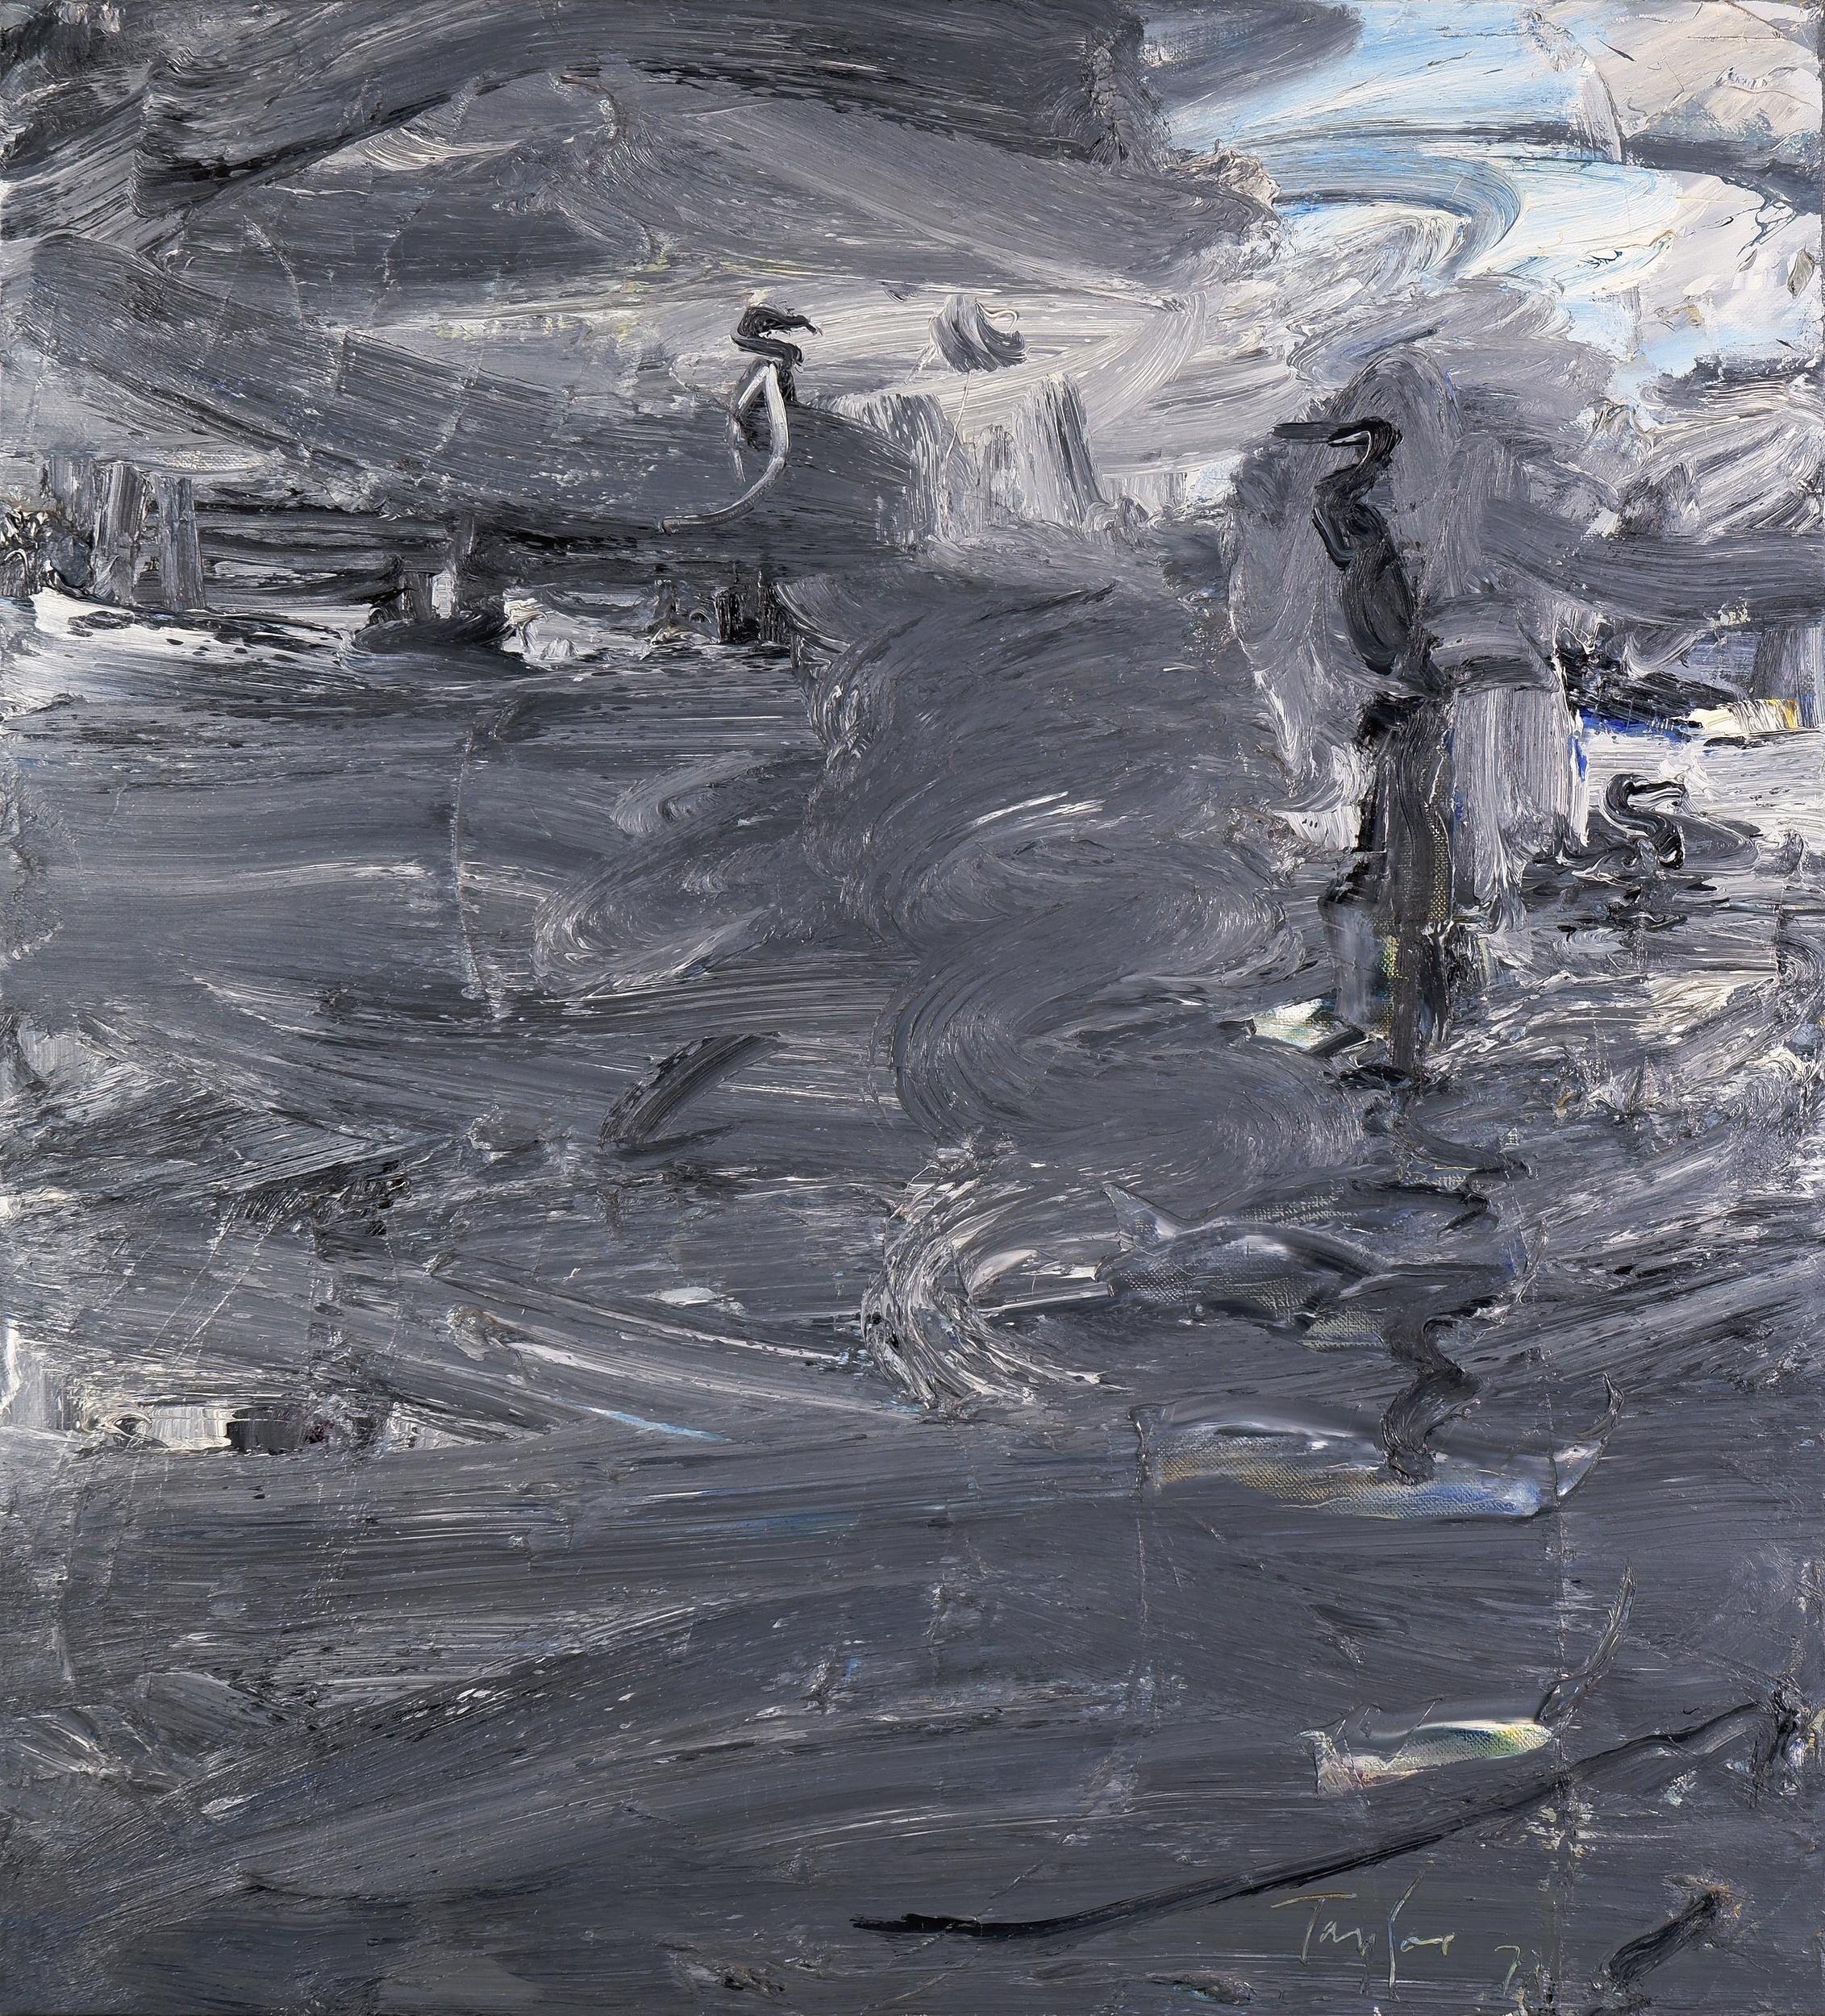 'Michael Franklin Taylor (born 1933), Morning Bermagui 1979, Oil on Canvas, 106 x 96 cm'